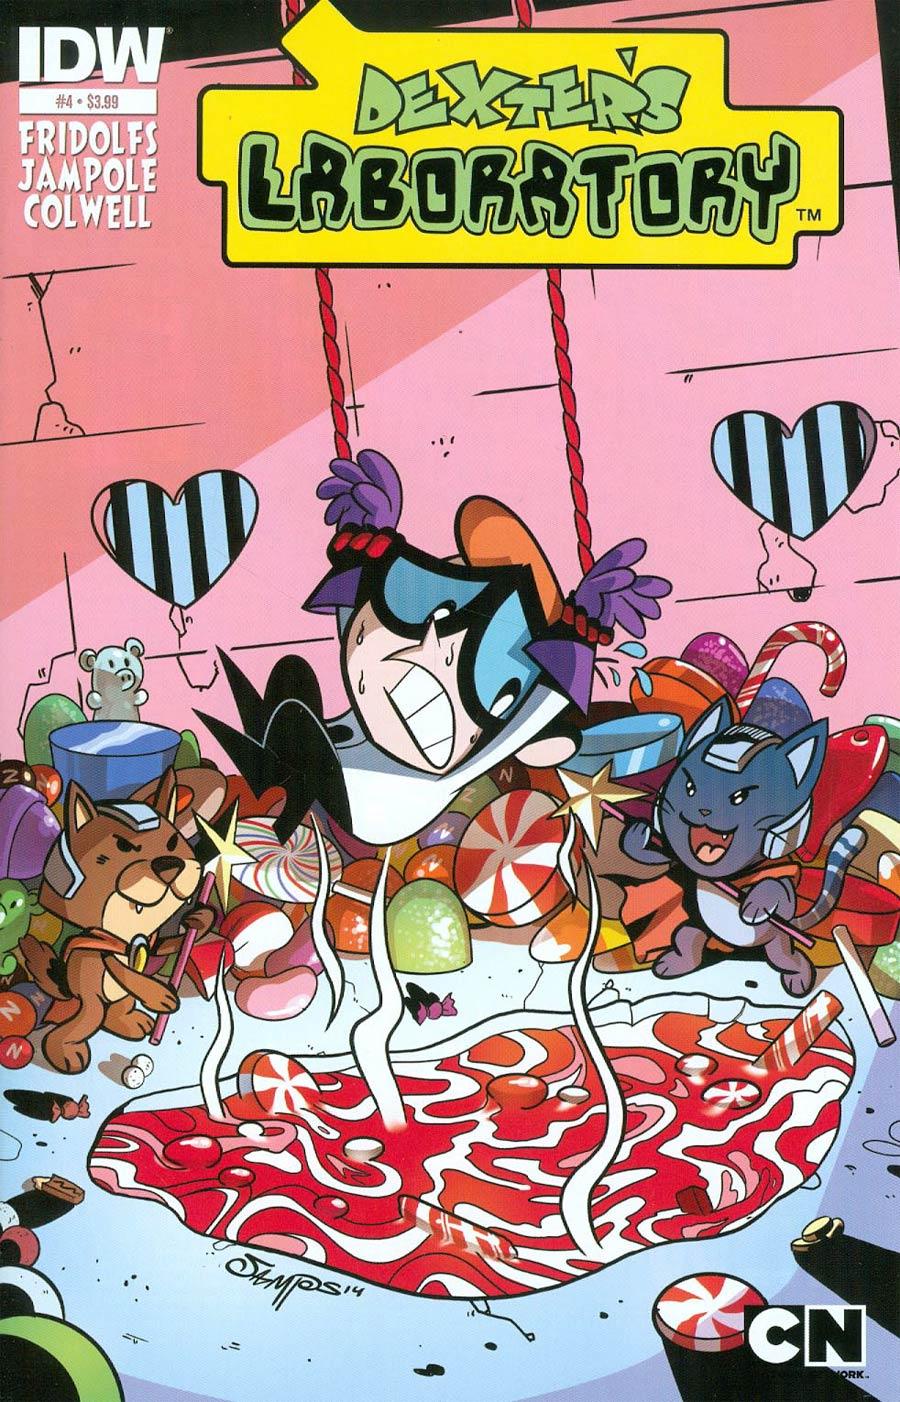 Dexters Laboratory Vol 2 #4 Cover A Regular Ryan Jampole Cover